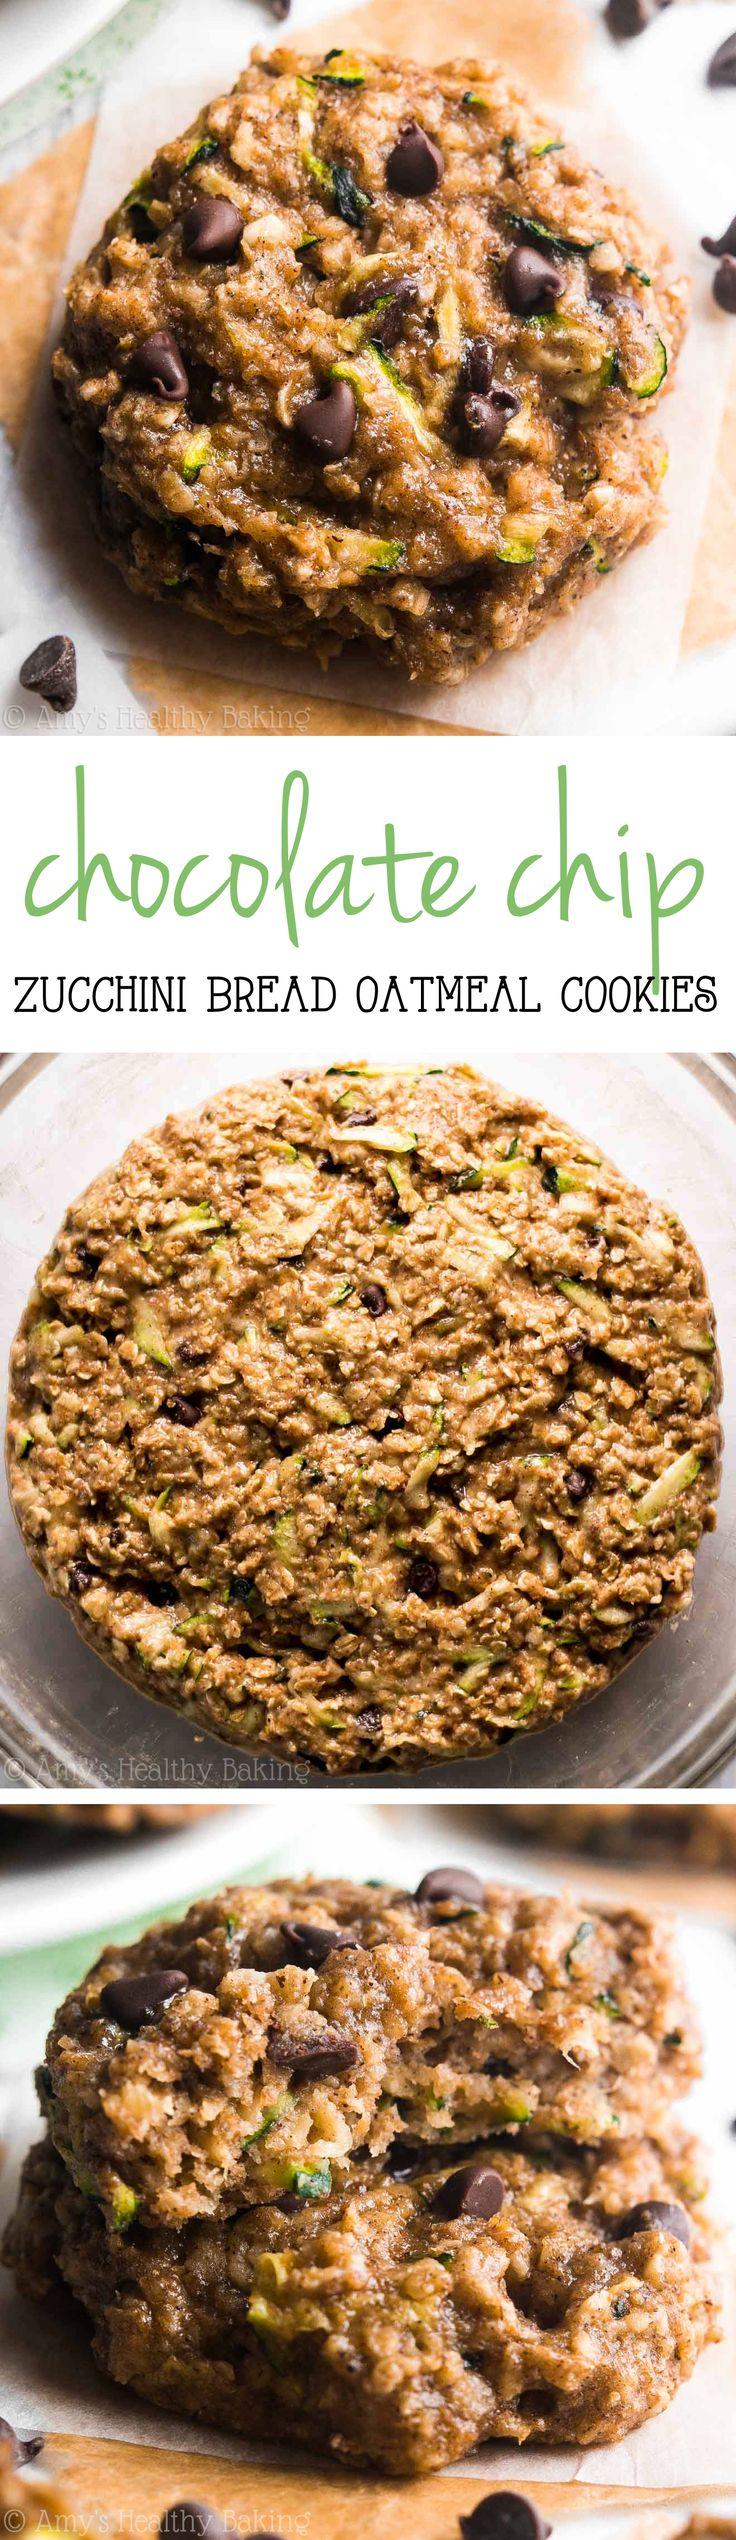 Best 25+ Healthy zucchini cookies ideas on Pinterest | Zucchini ...